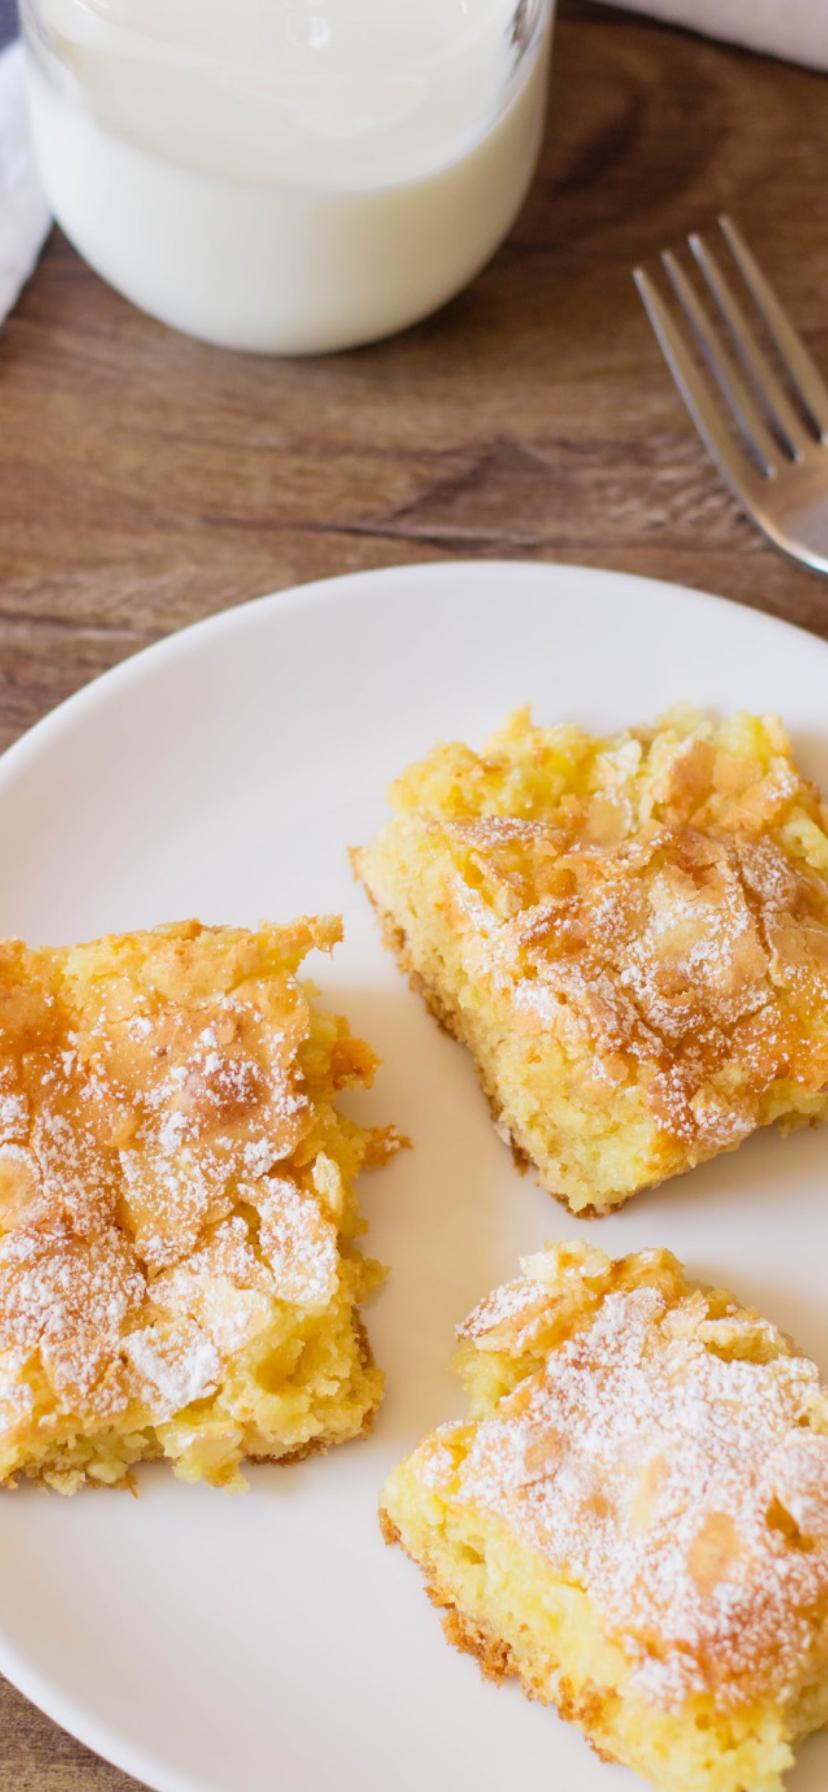 Easy Ooey Gooey Butter Cake - BubbaPie